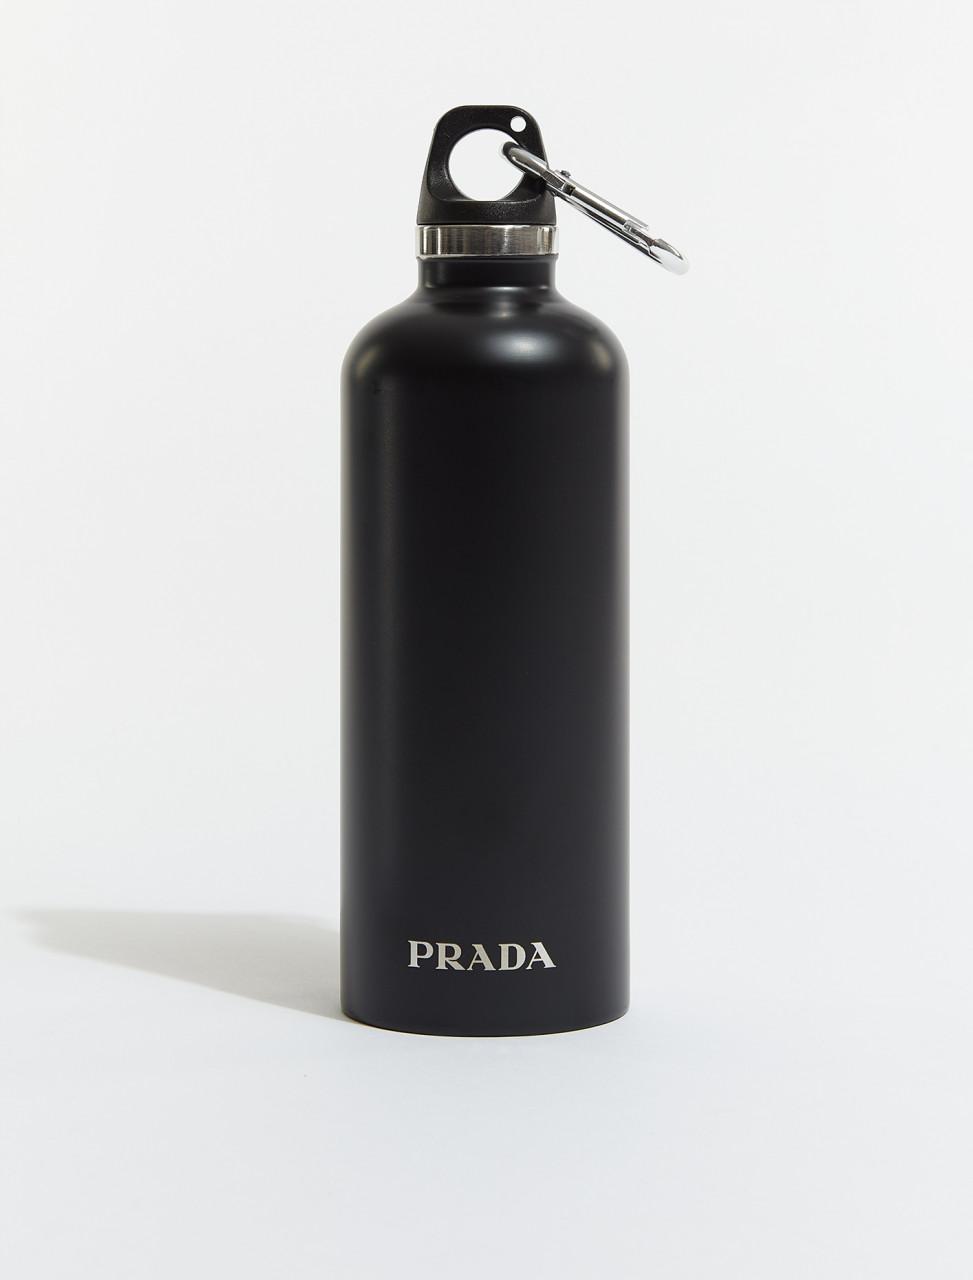 2UH003-F0002 PRADA STAINLESS STEEL WATER BOTTLE BLACK